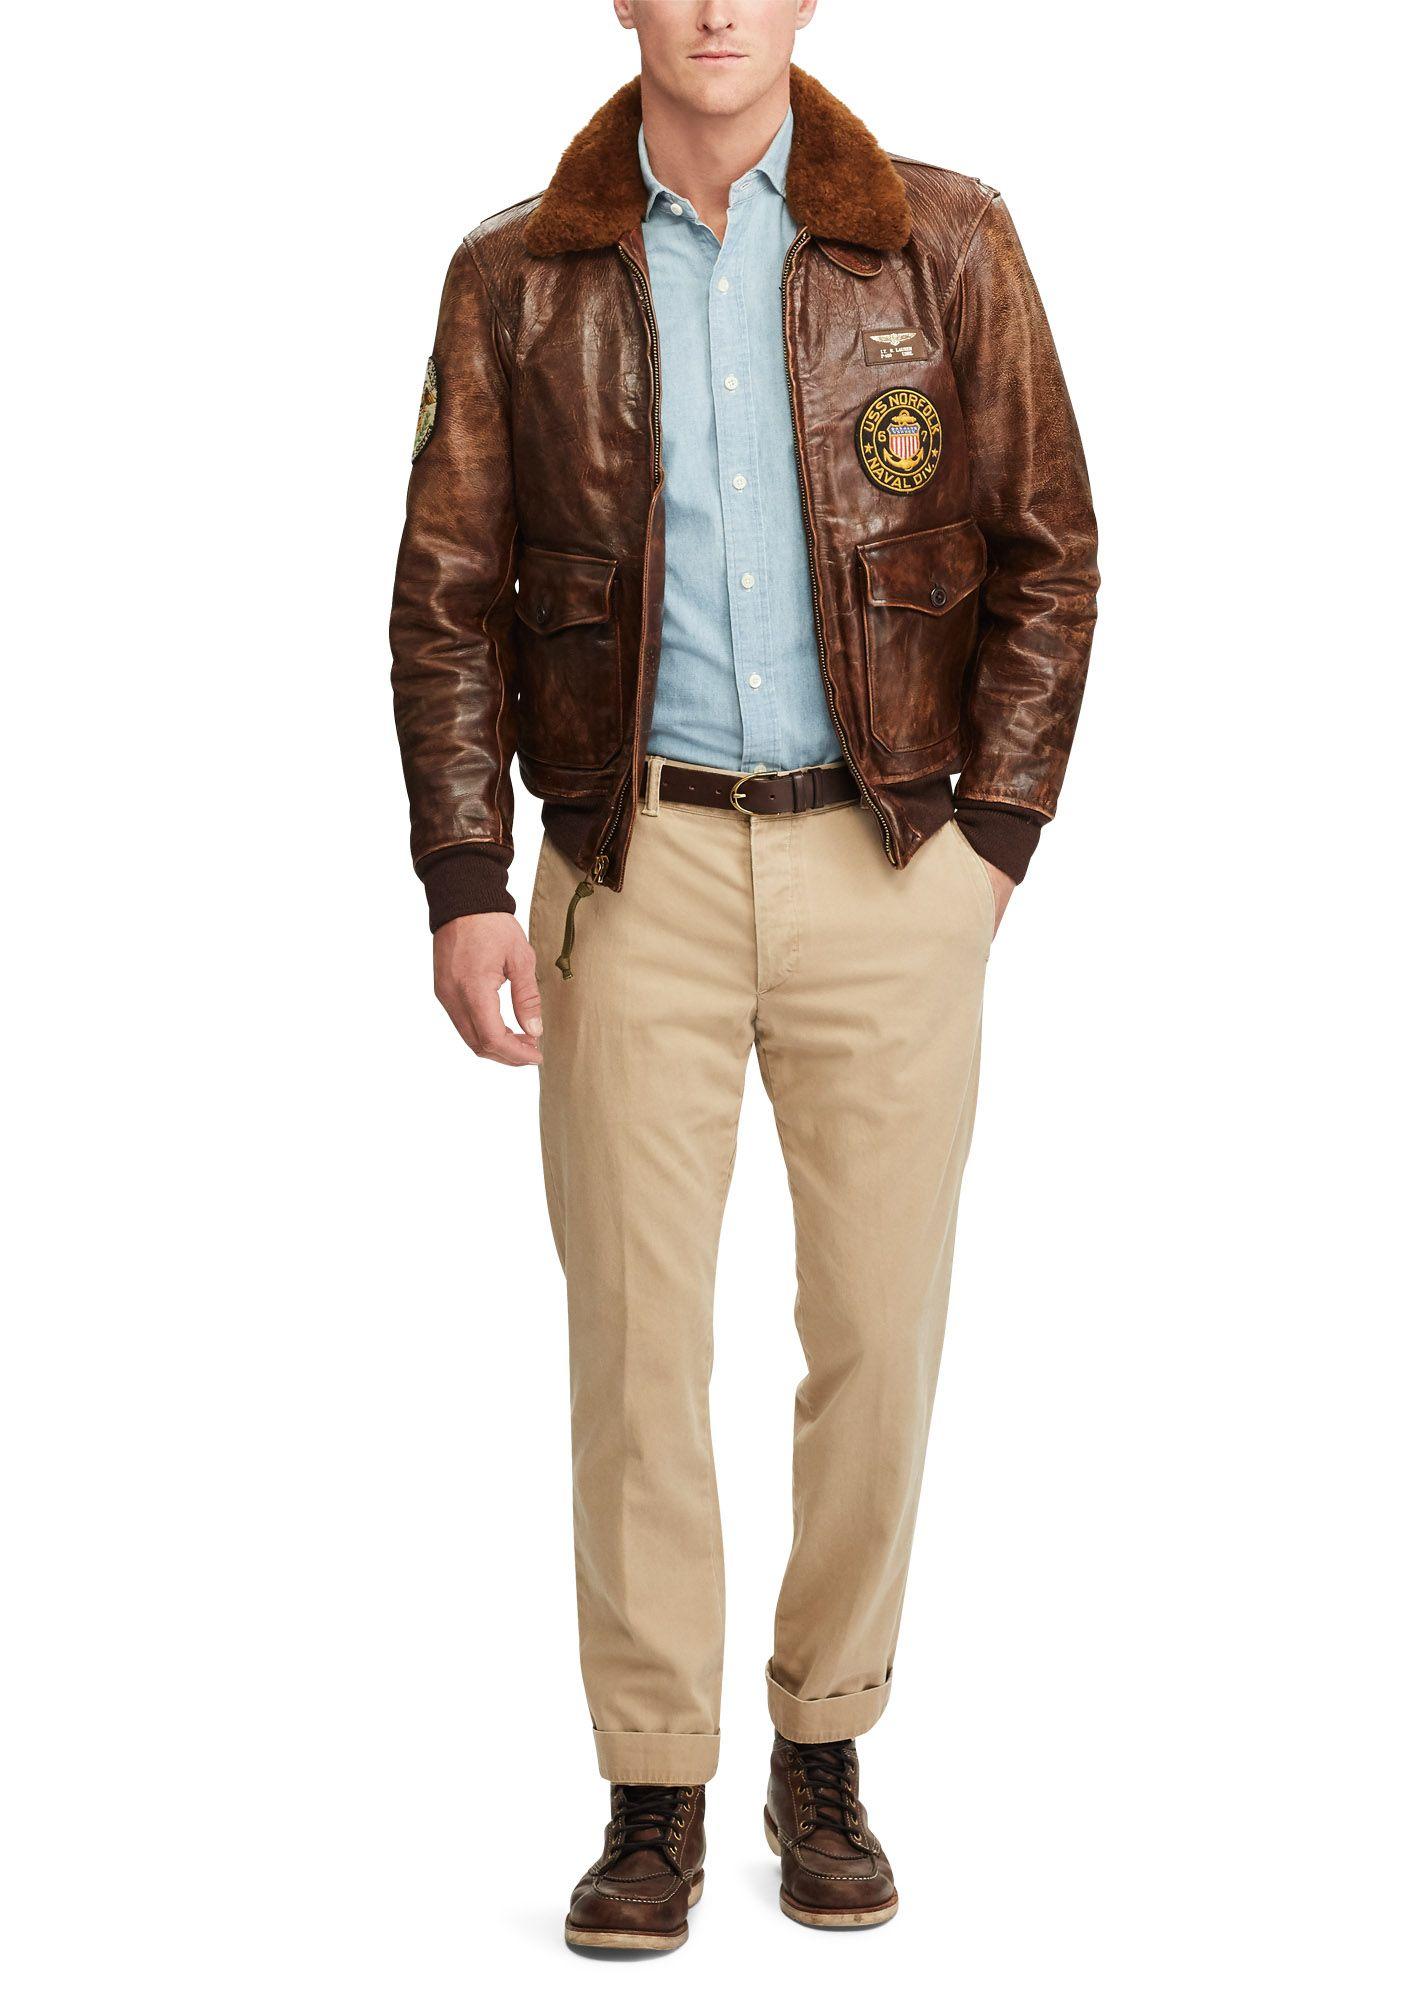 Polo Ralph Lauren The Iconic G 1 Bomber Jacket Leather Jacket Outfit Men Leather Jacket Men Bomber Jacket [ 2000 x 1427 Pixel ]